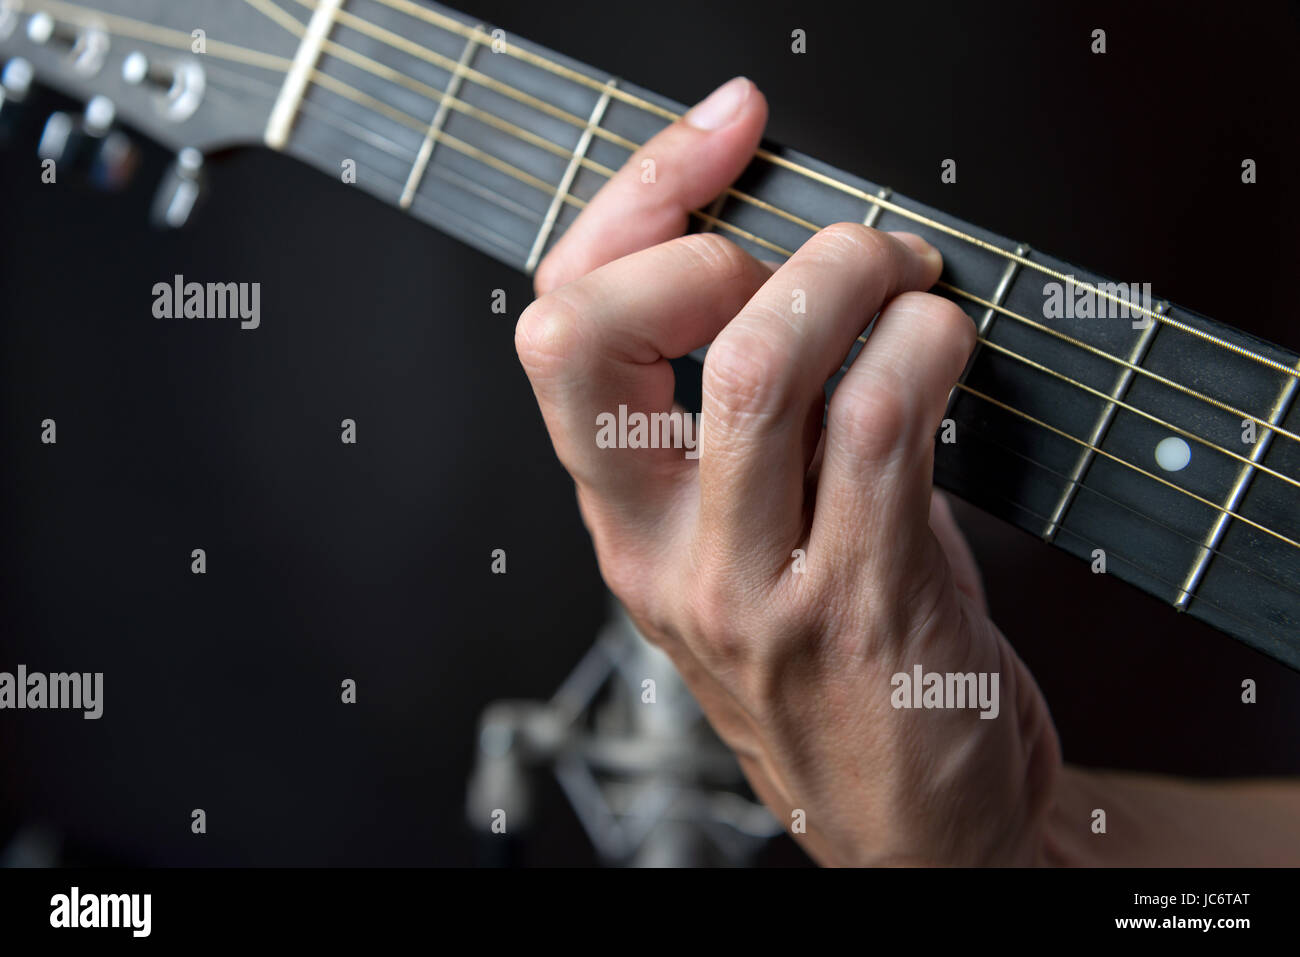 G Major Chord Stock Photos G Major Chord Stock Images Alamy